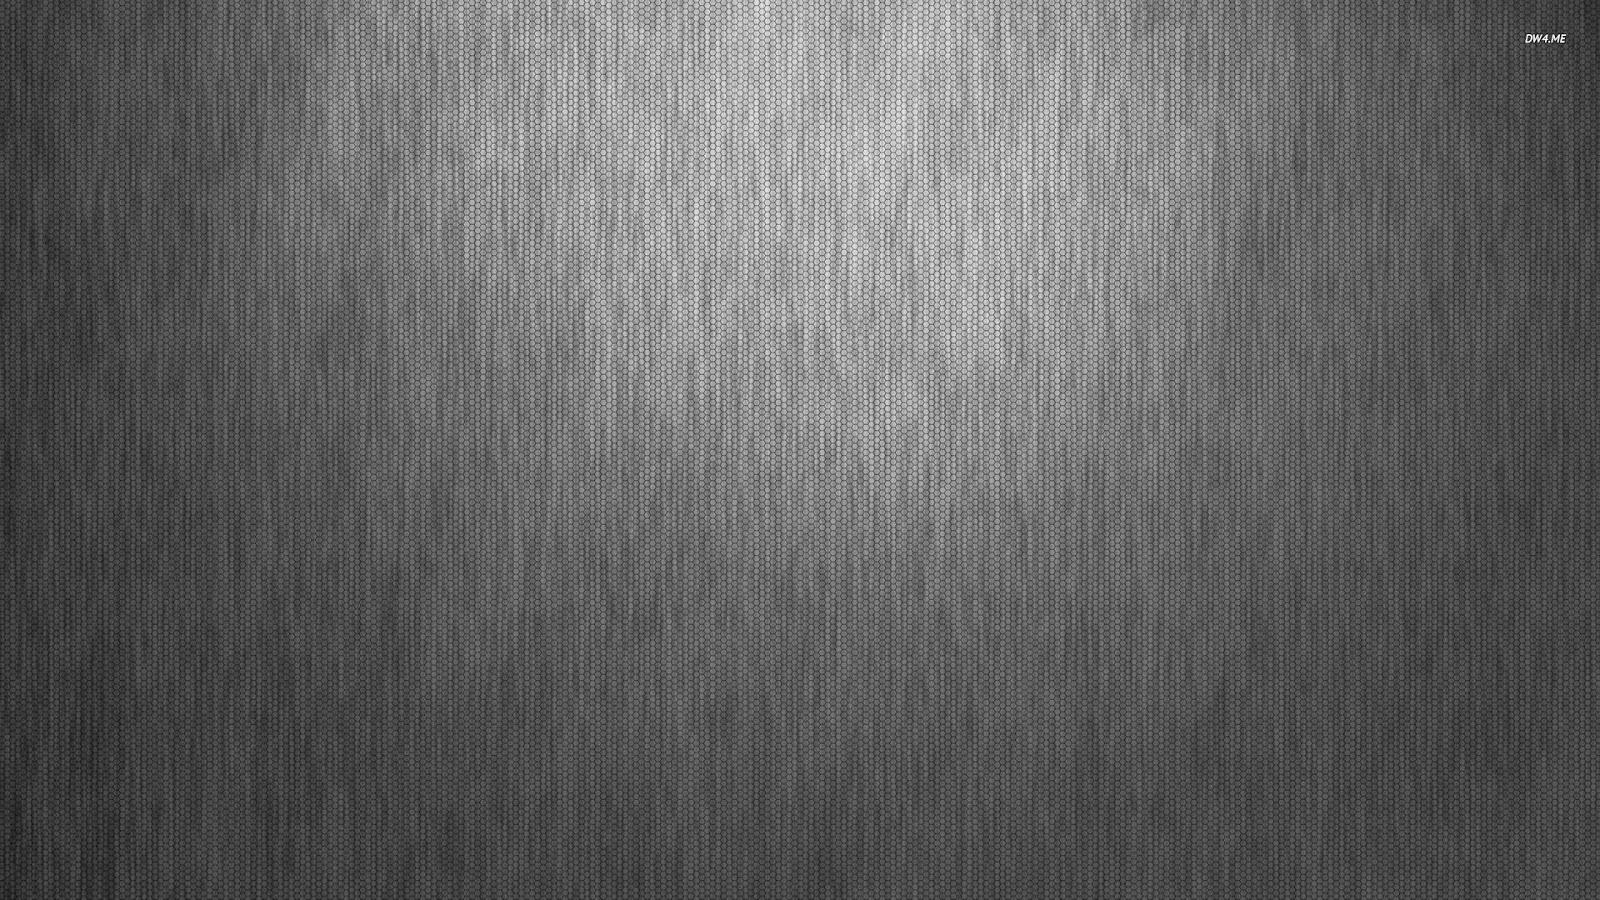 Silver Hd Wallpaper: Silver Desktop Background